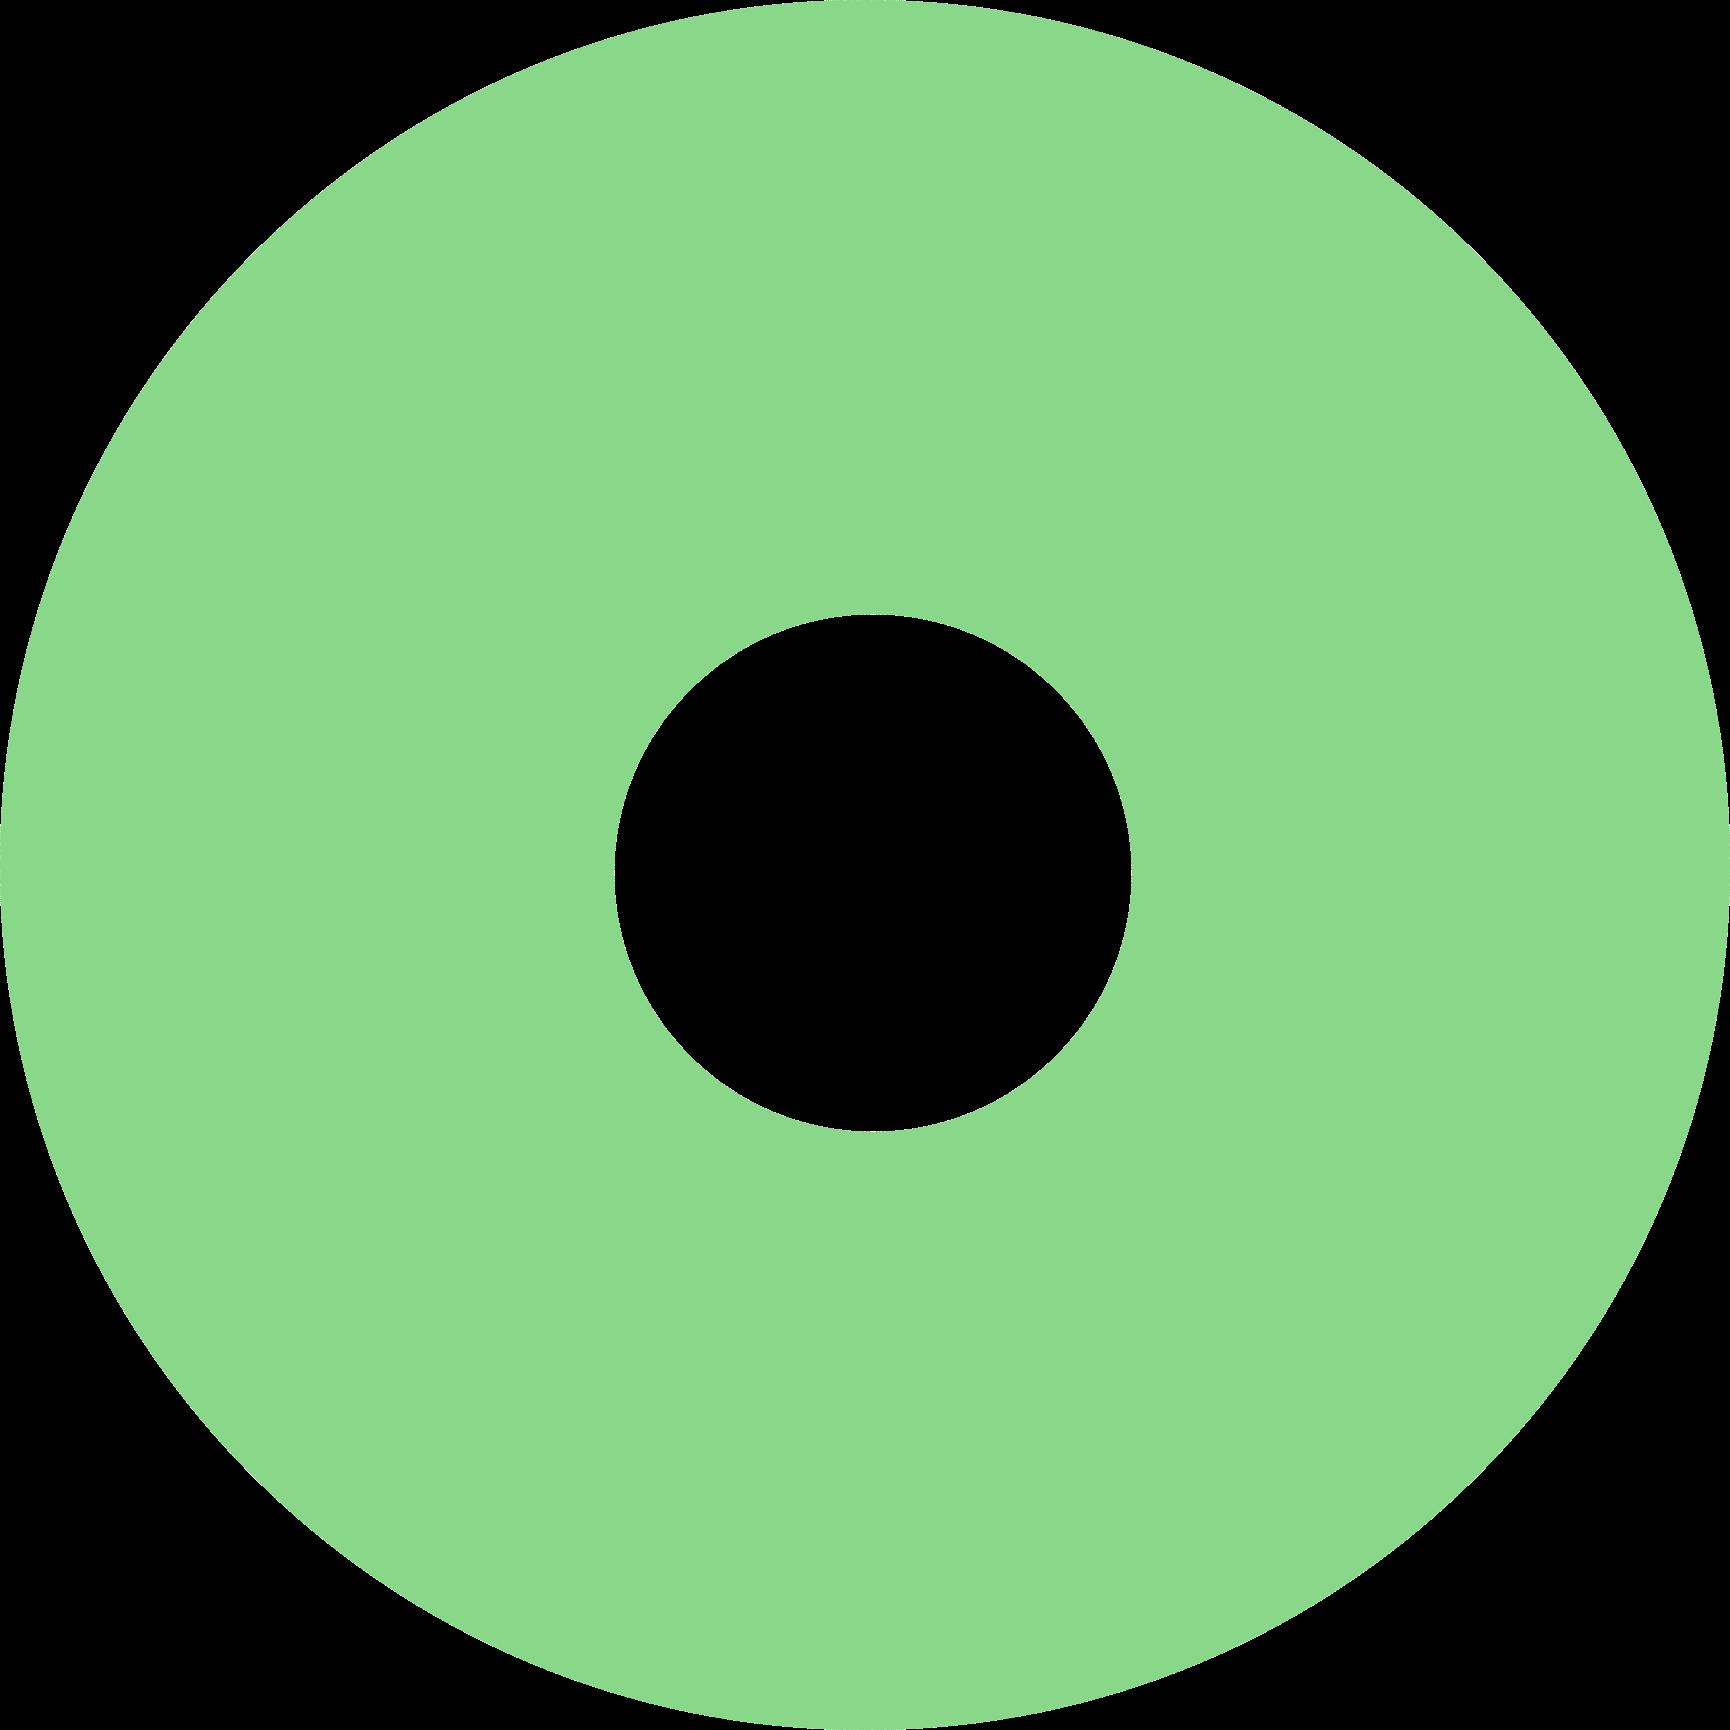 Translucent Green Grantbook Circle